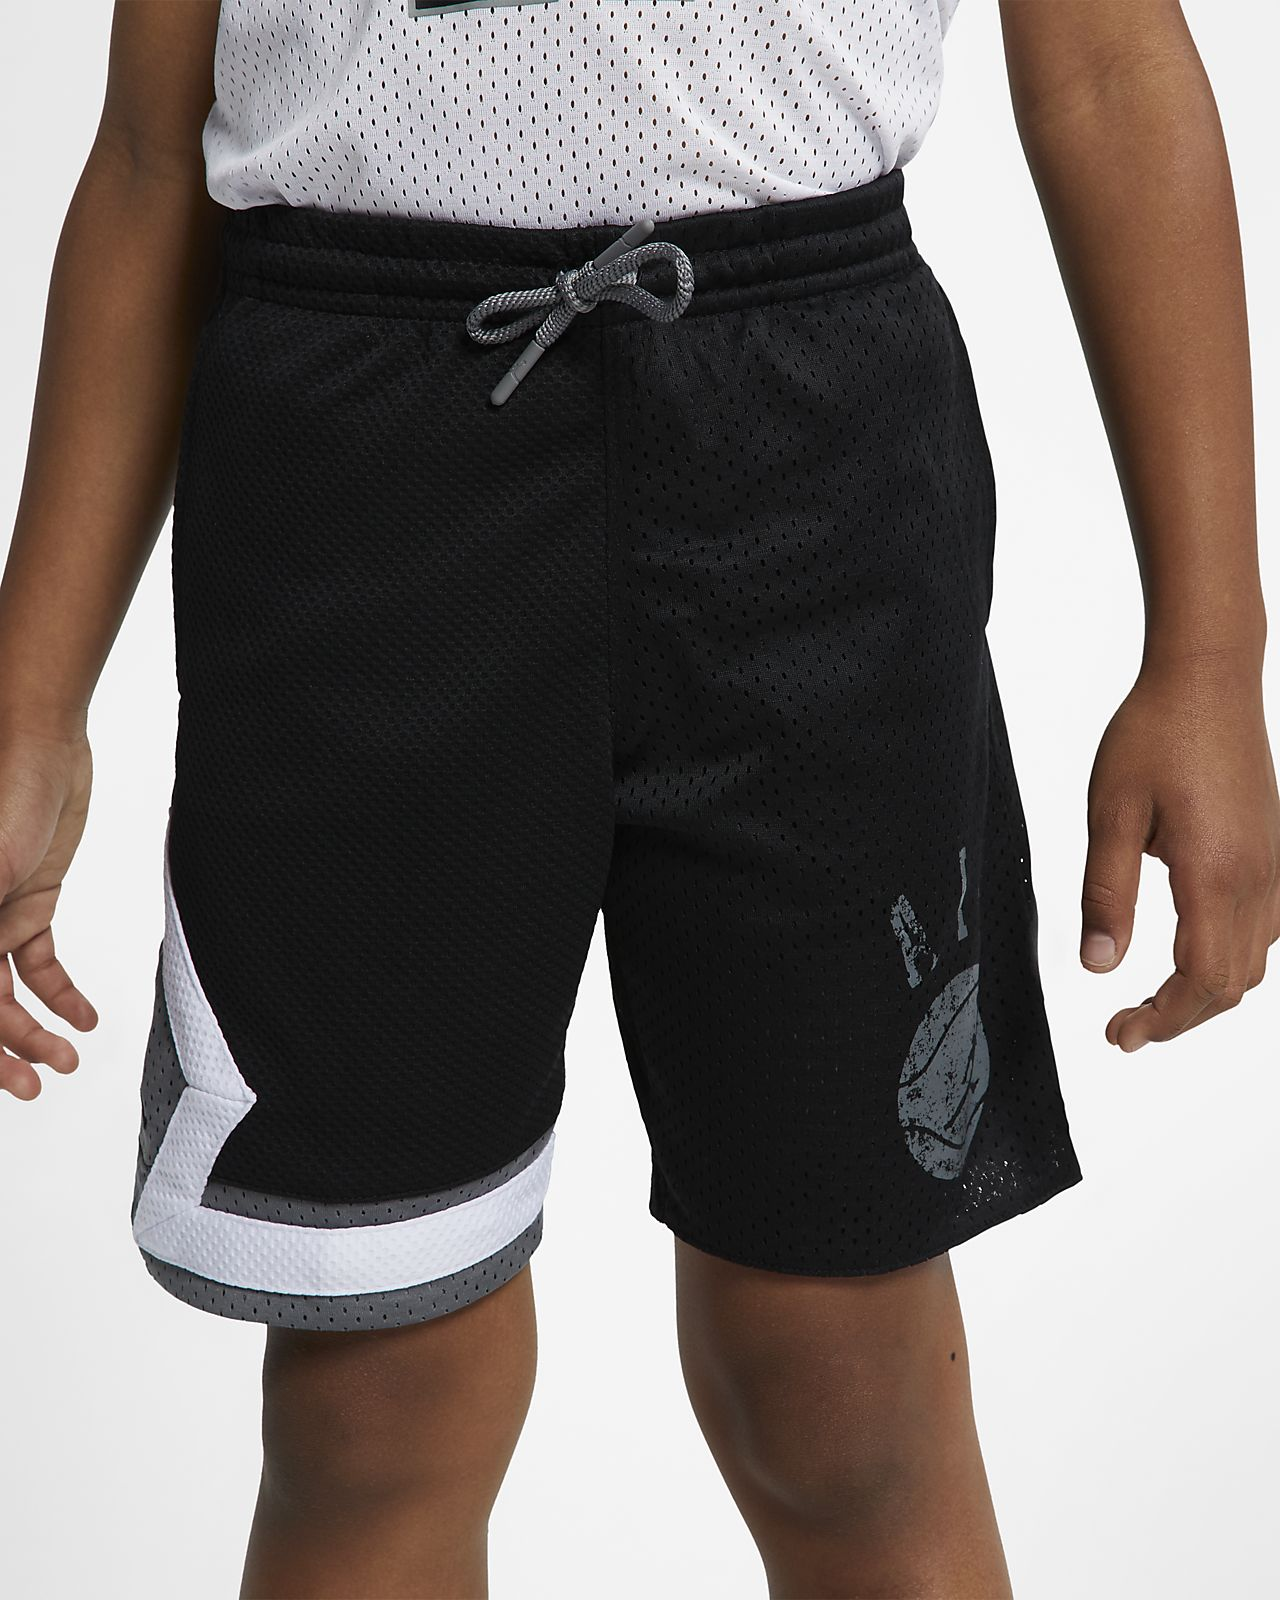 Jordan Dri-FIT Pantalón corto - Niño/a pequeño/a